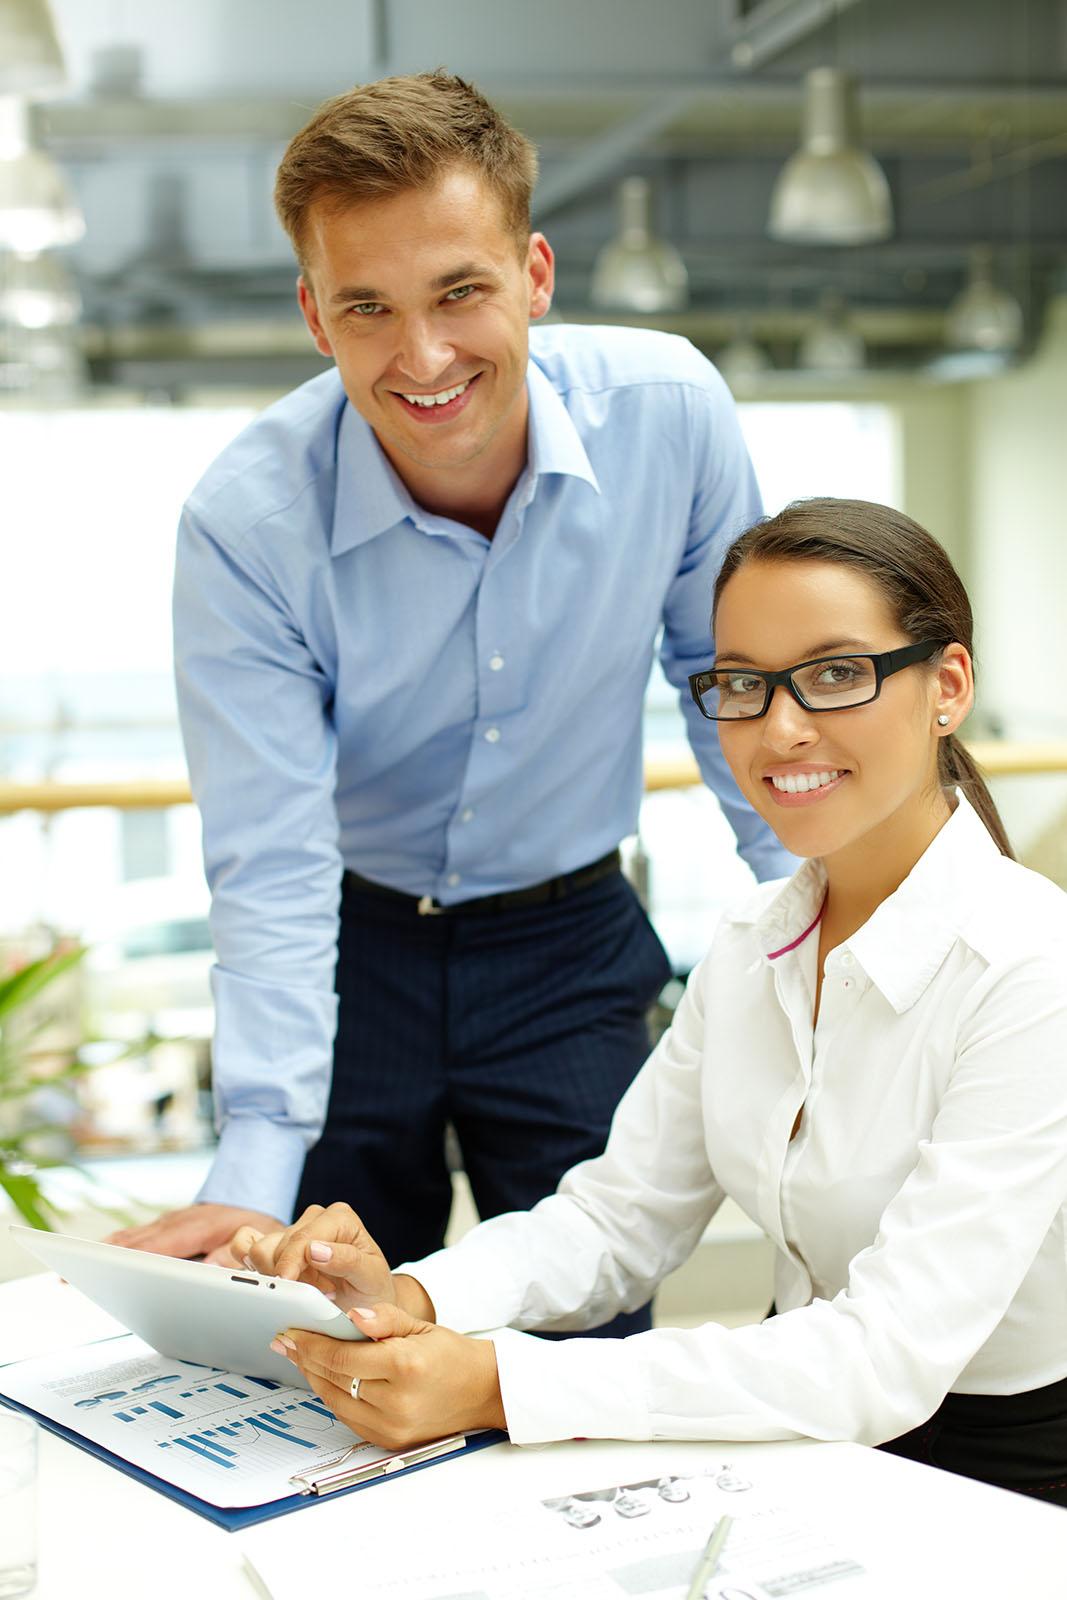 09 - Marca Personal para emprendedores